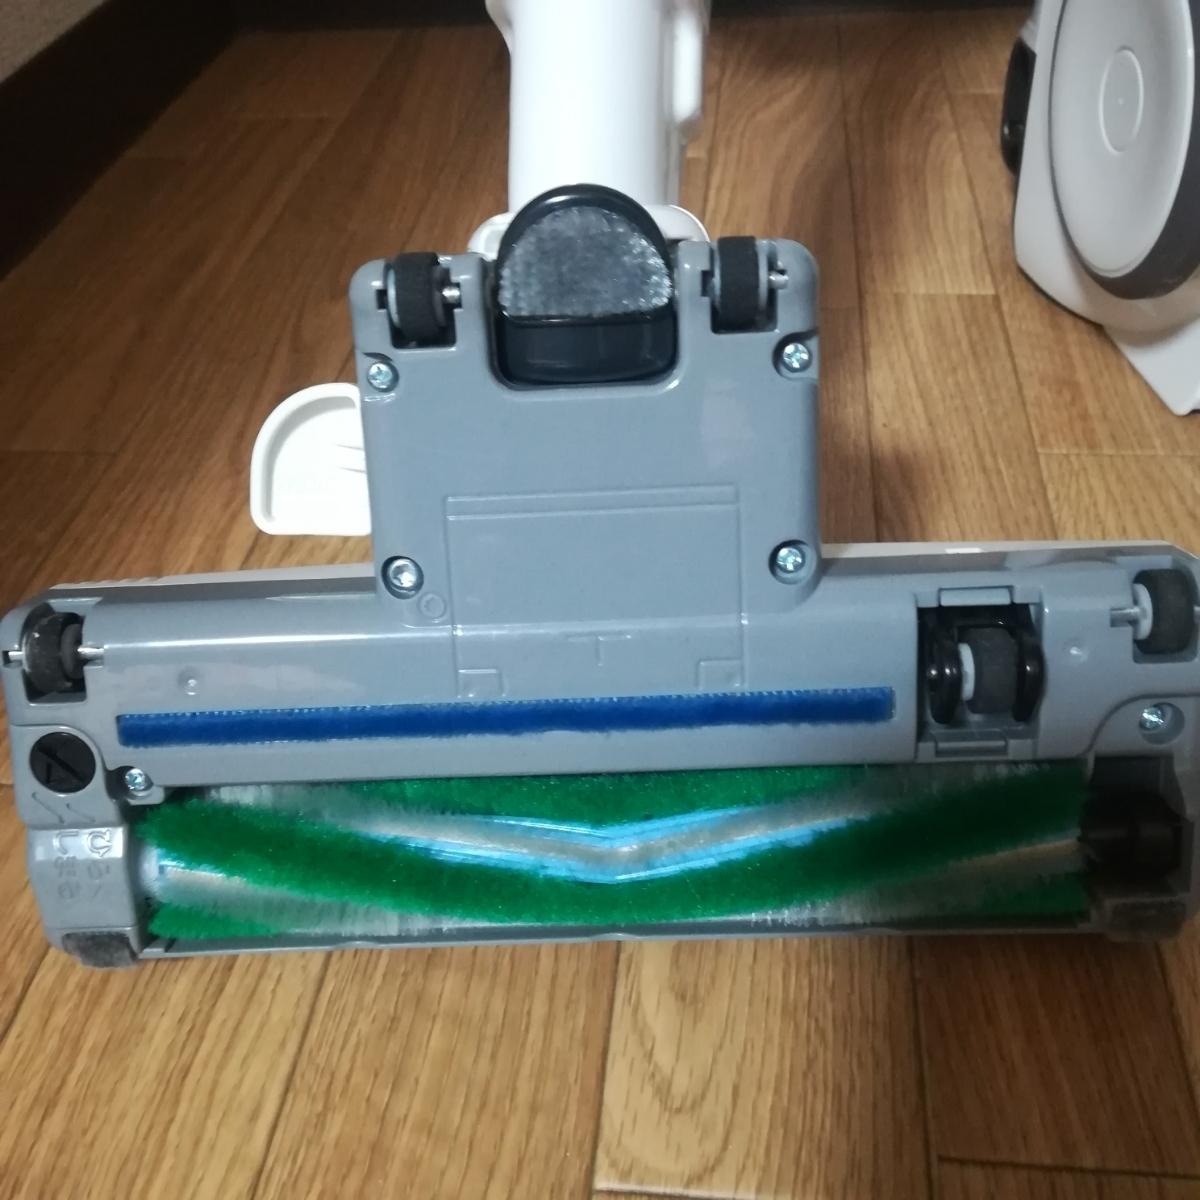 MC-SJP520G パナソニック 掃除機 新品紙パック付 送料無料 美品_画像6